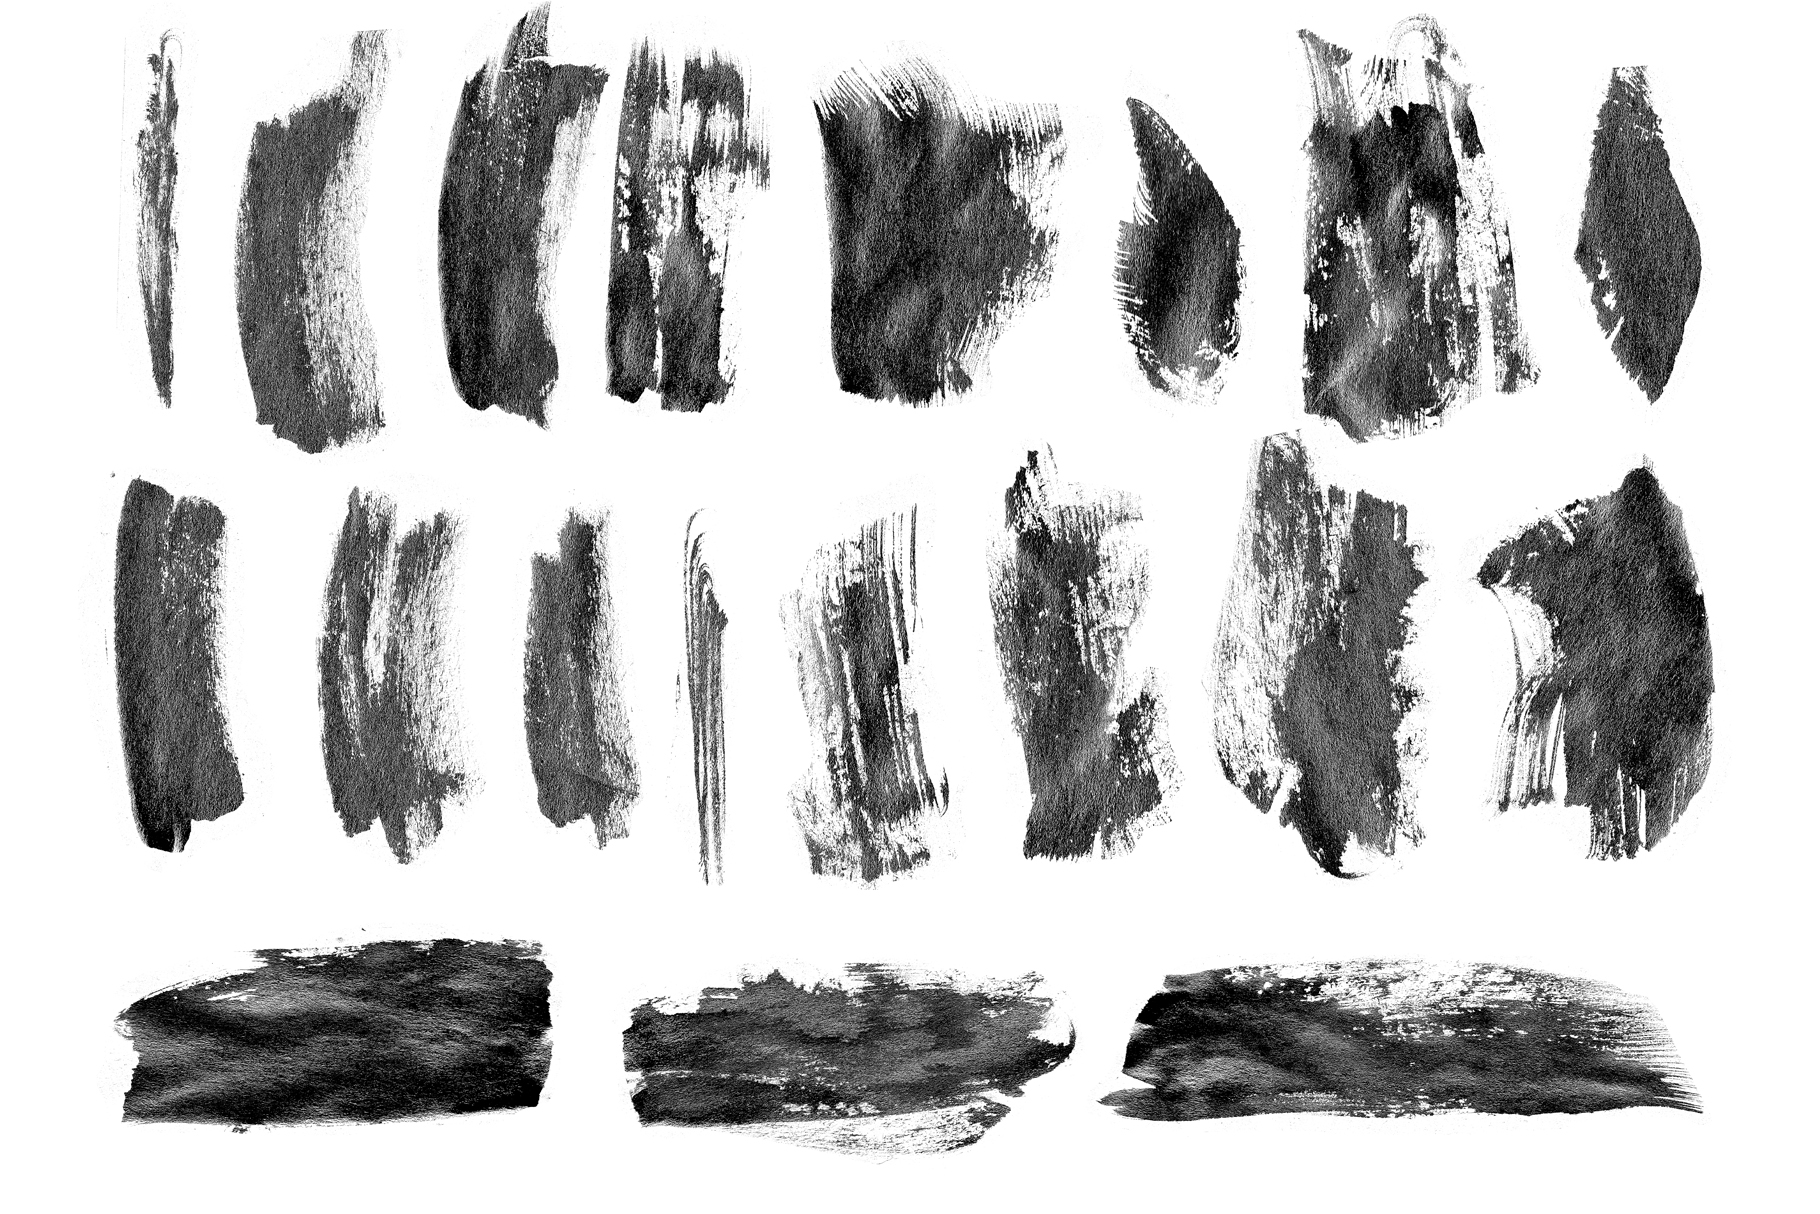 516 textures big set. example image 7